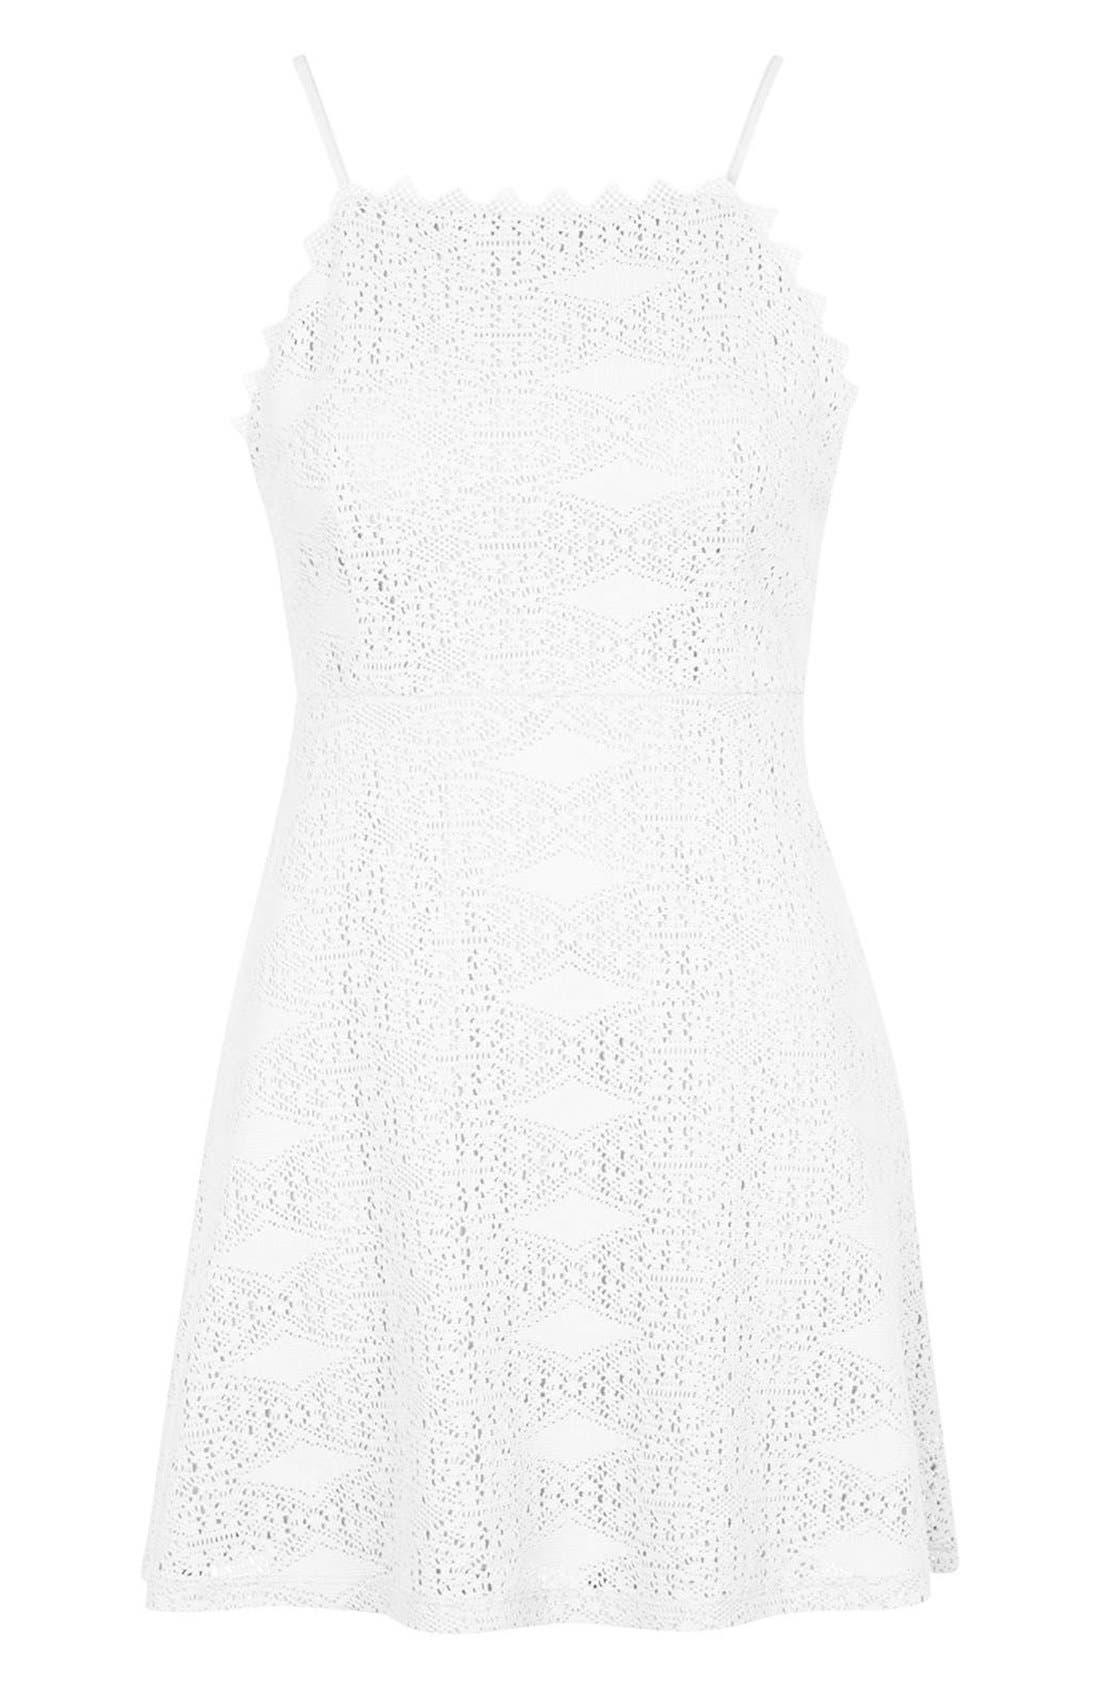 TOPSHOP,                             Crochet Dress,                             Alternate thumbnail 3, color,                             900